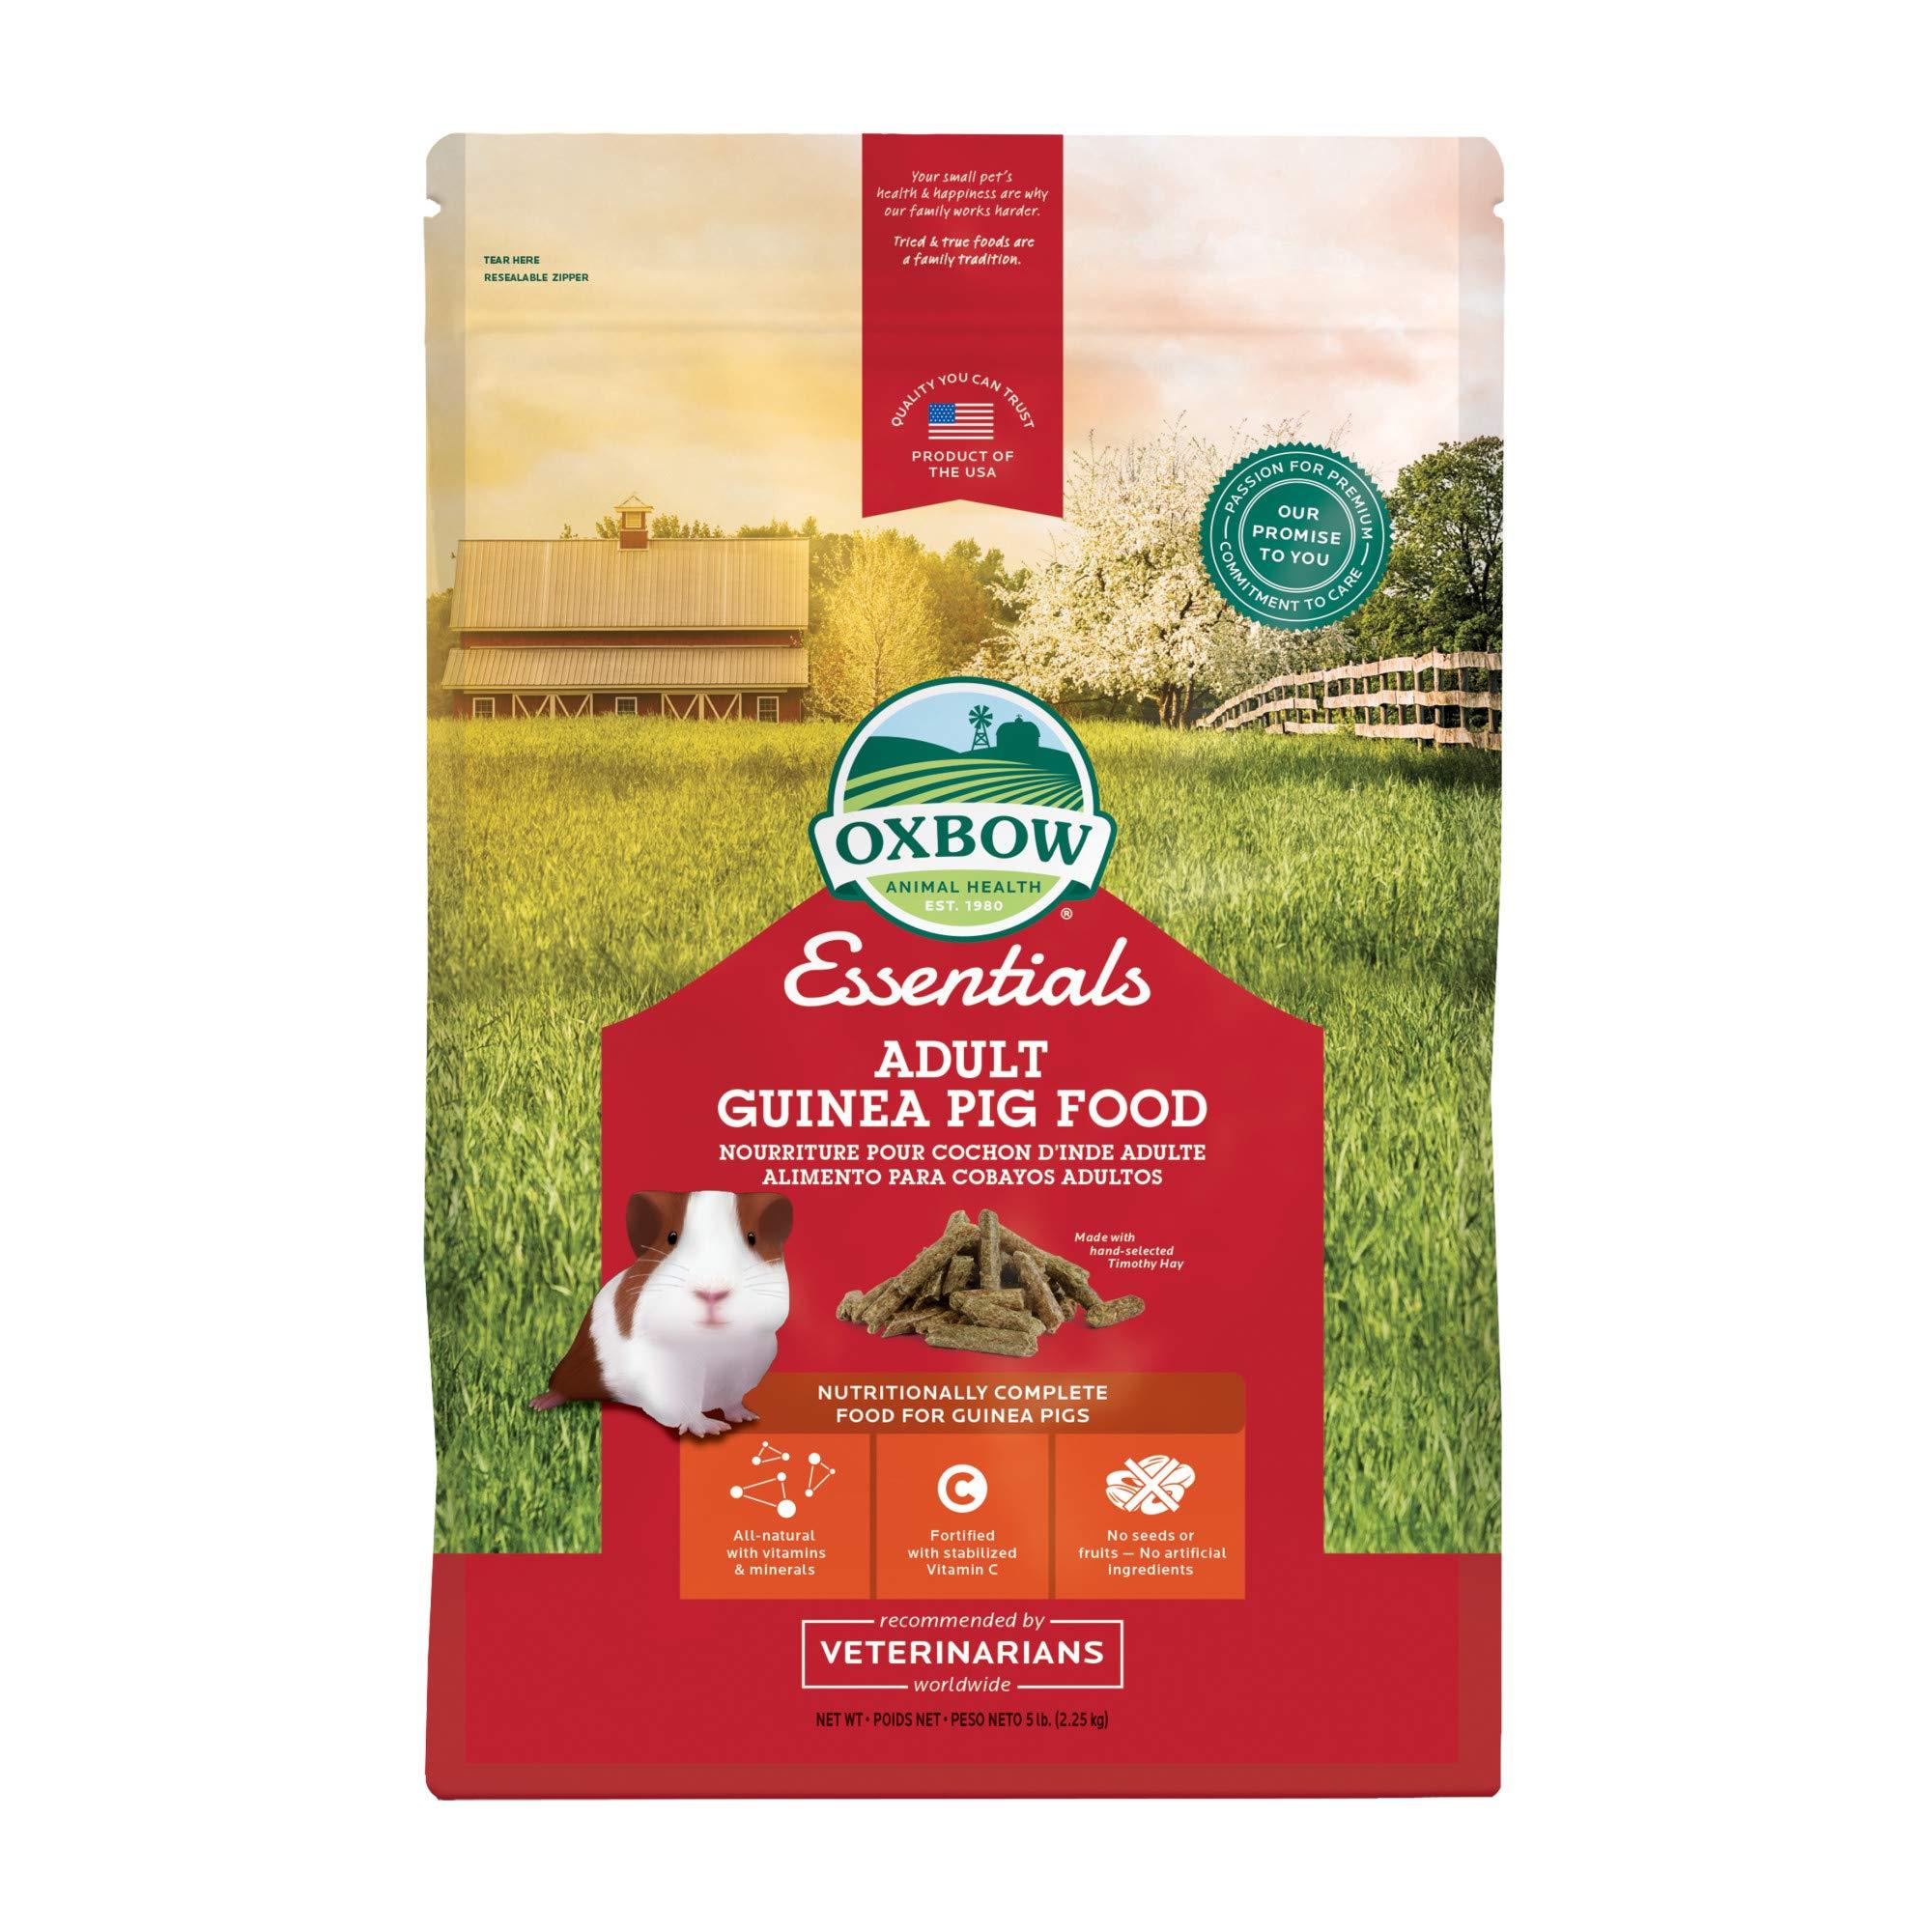 Oxbow Essentials Adult Guinea Pig Food - All Natural Adult Guinea Pig Pellets - 5 lb.